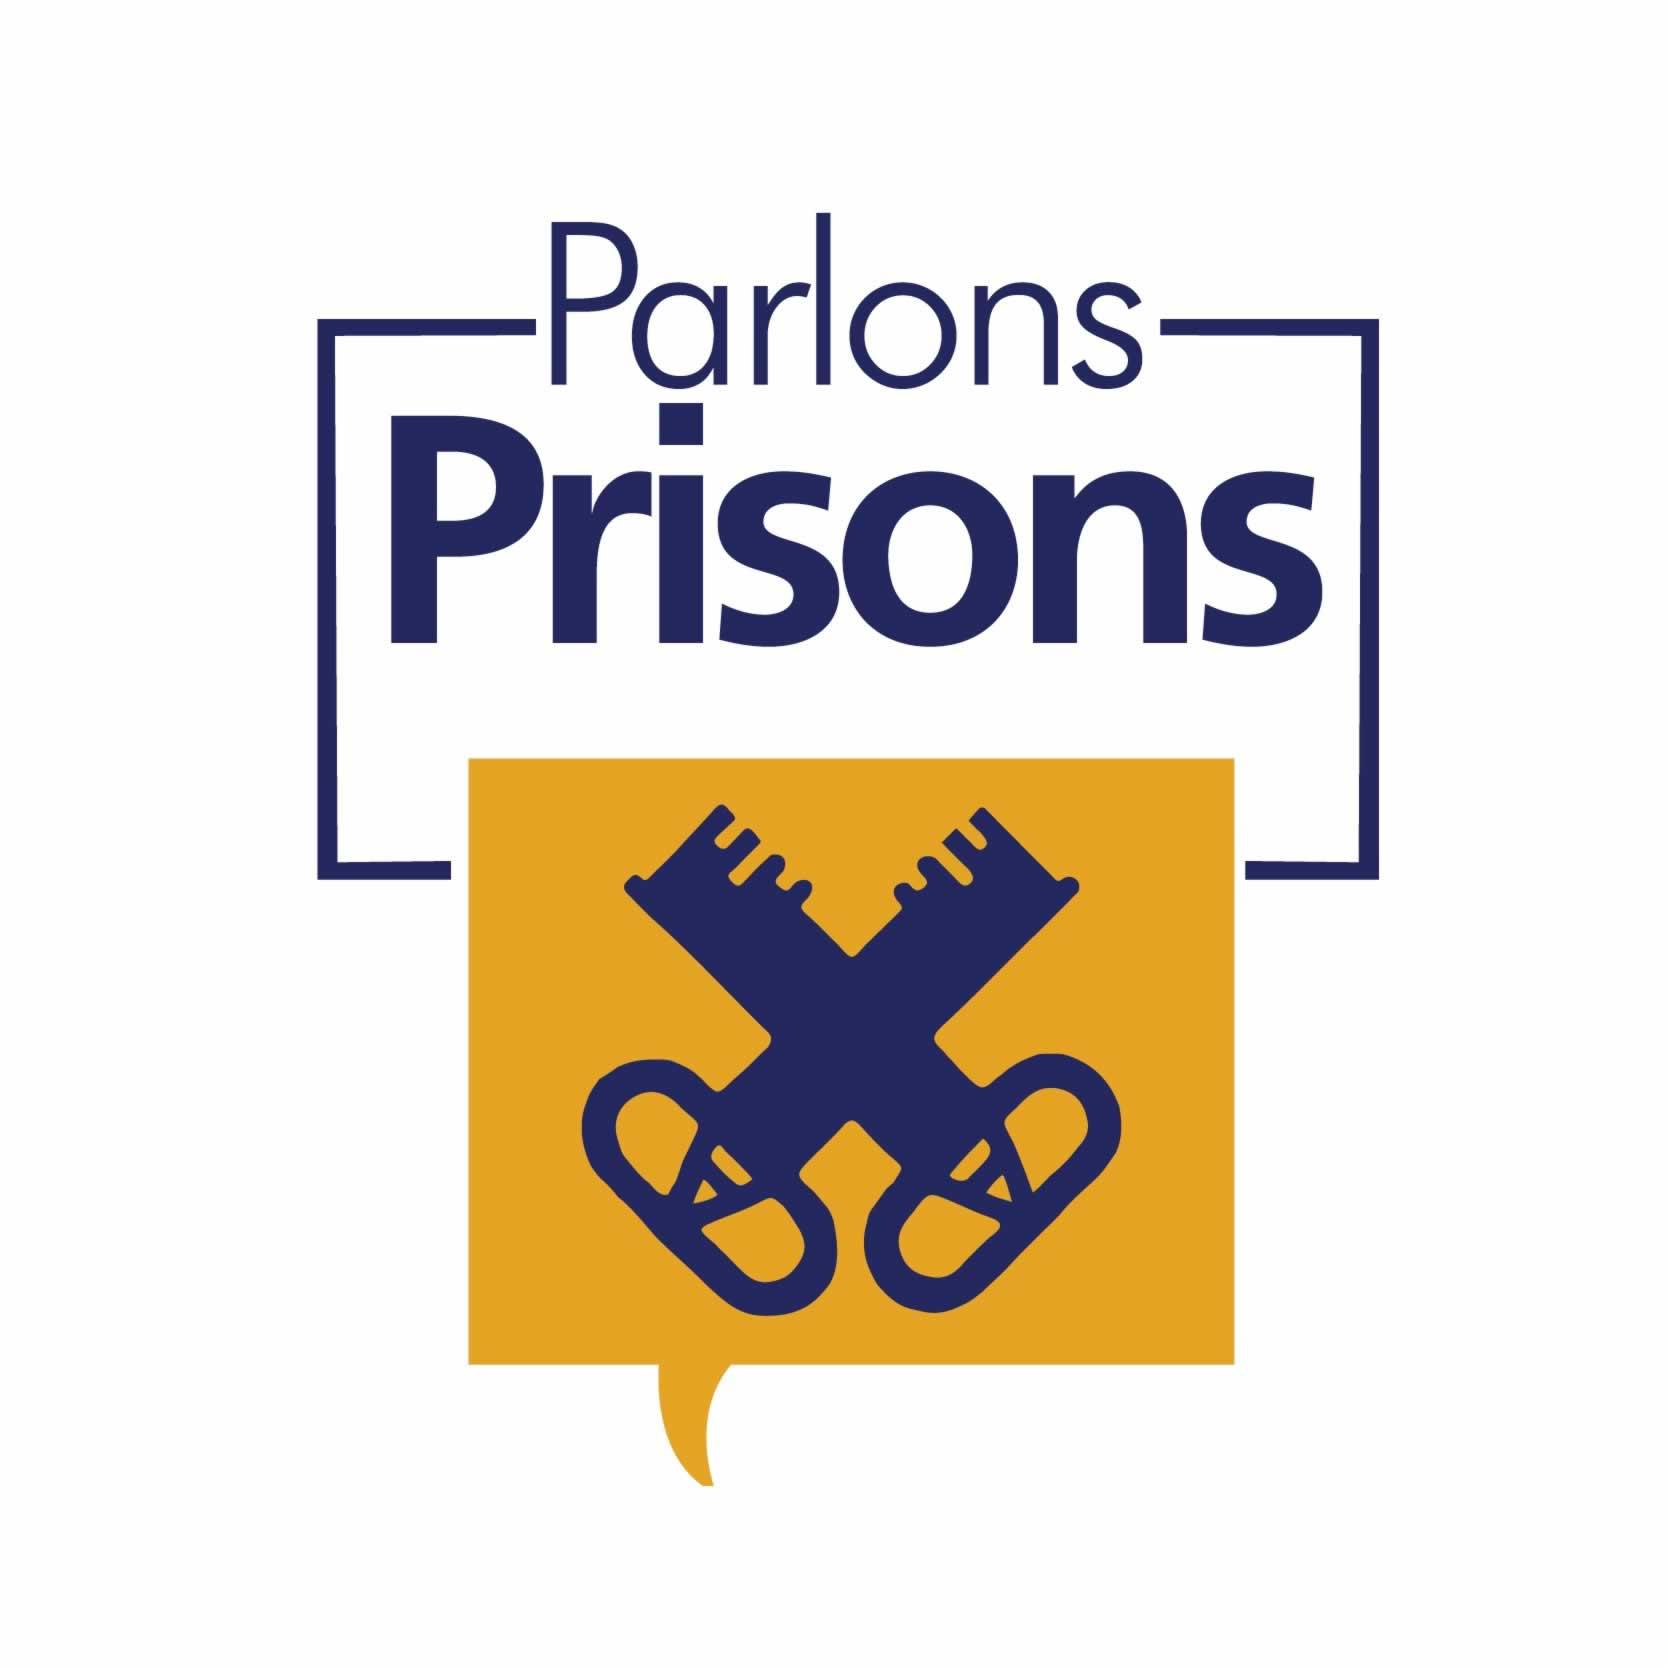 parlons_prisons.jpg